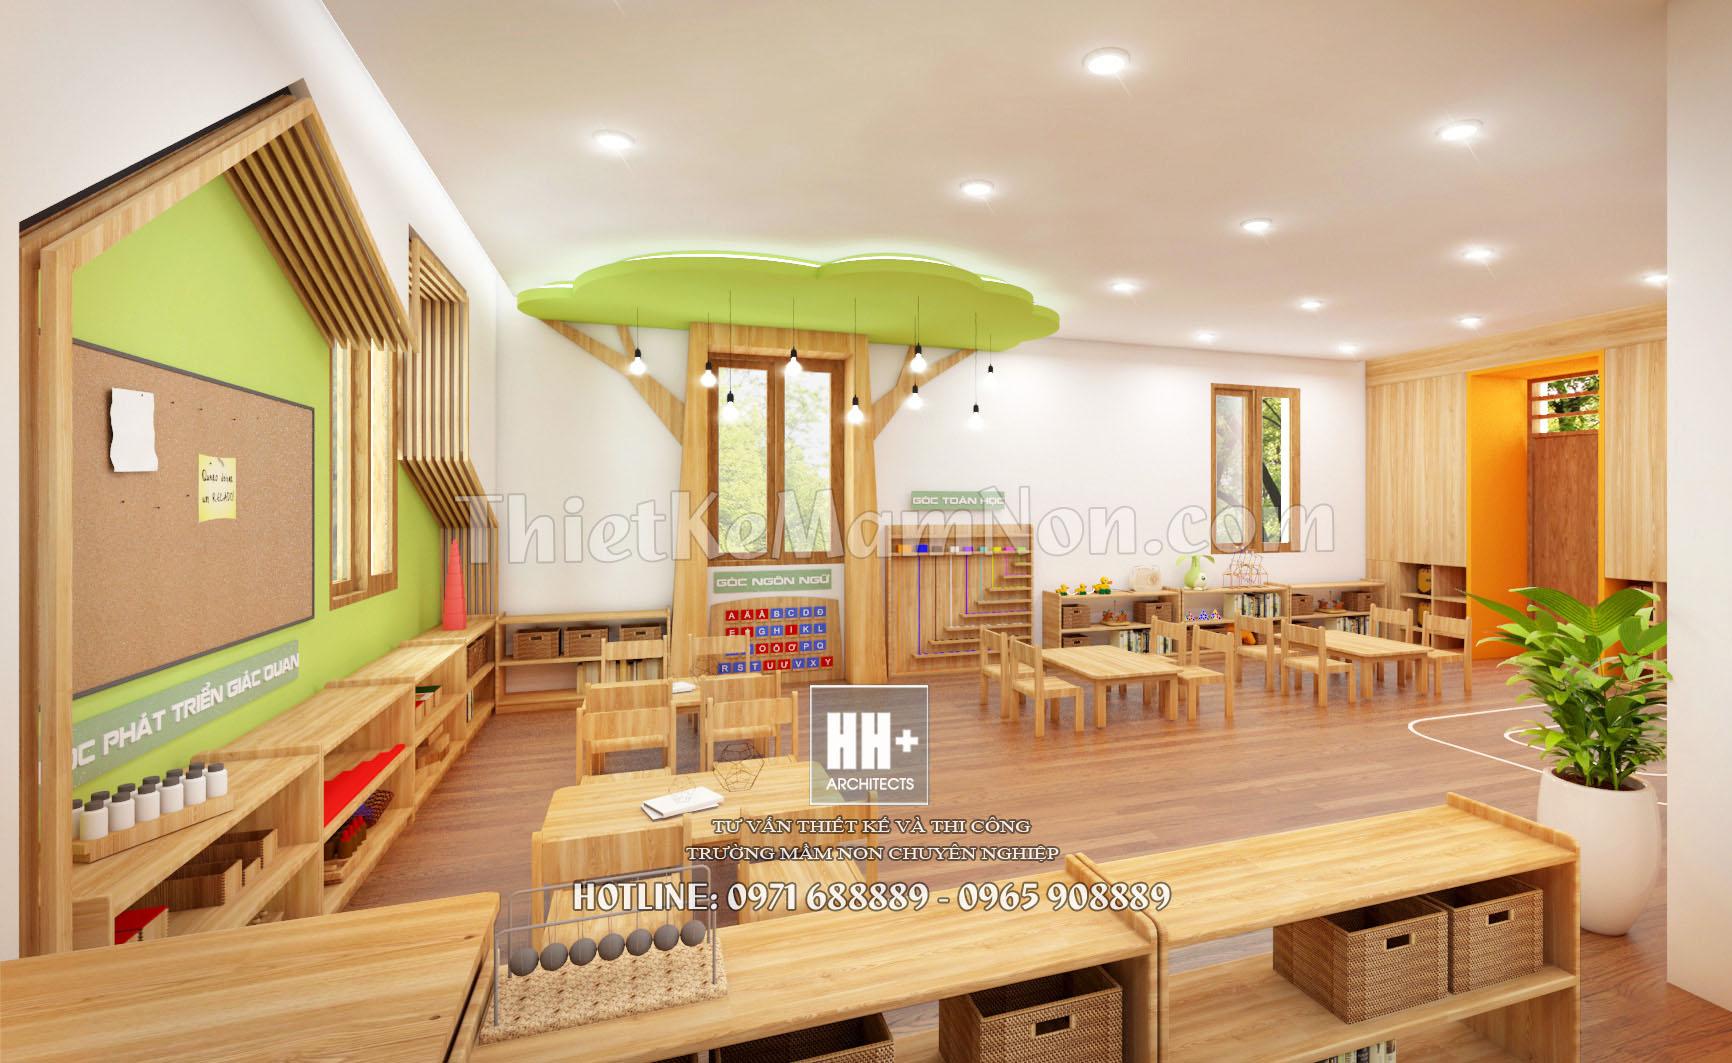 6 thiết kế trường mầm non montessori Thiết kế trường mầm non montessori Việt Anh 6 1